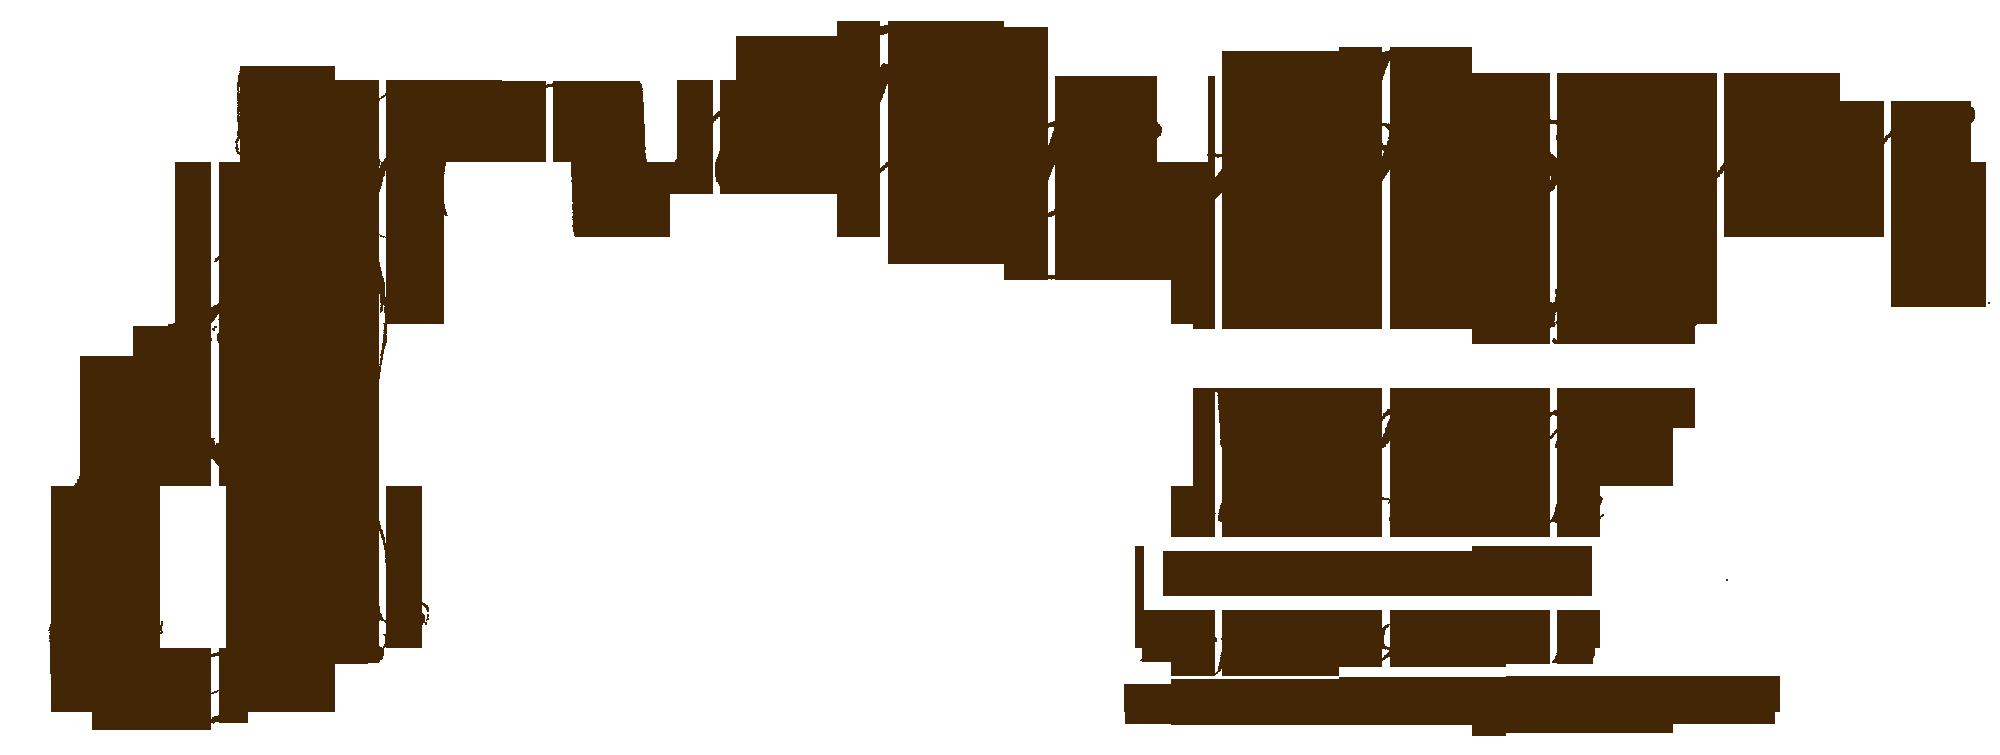 Wodans-logo-4b